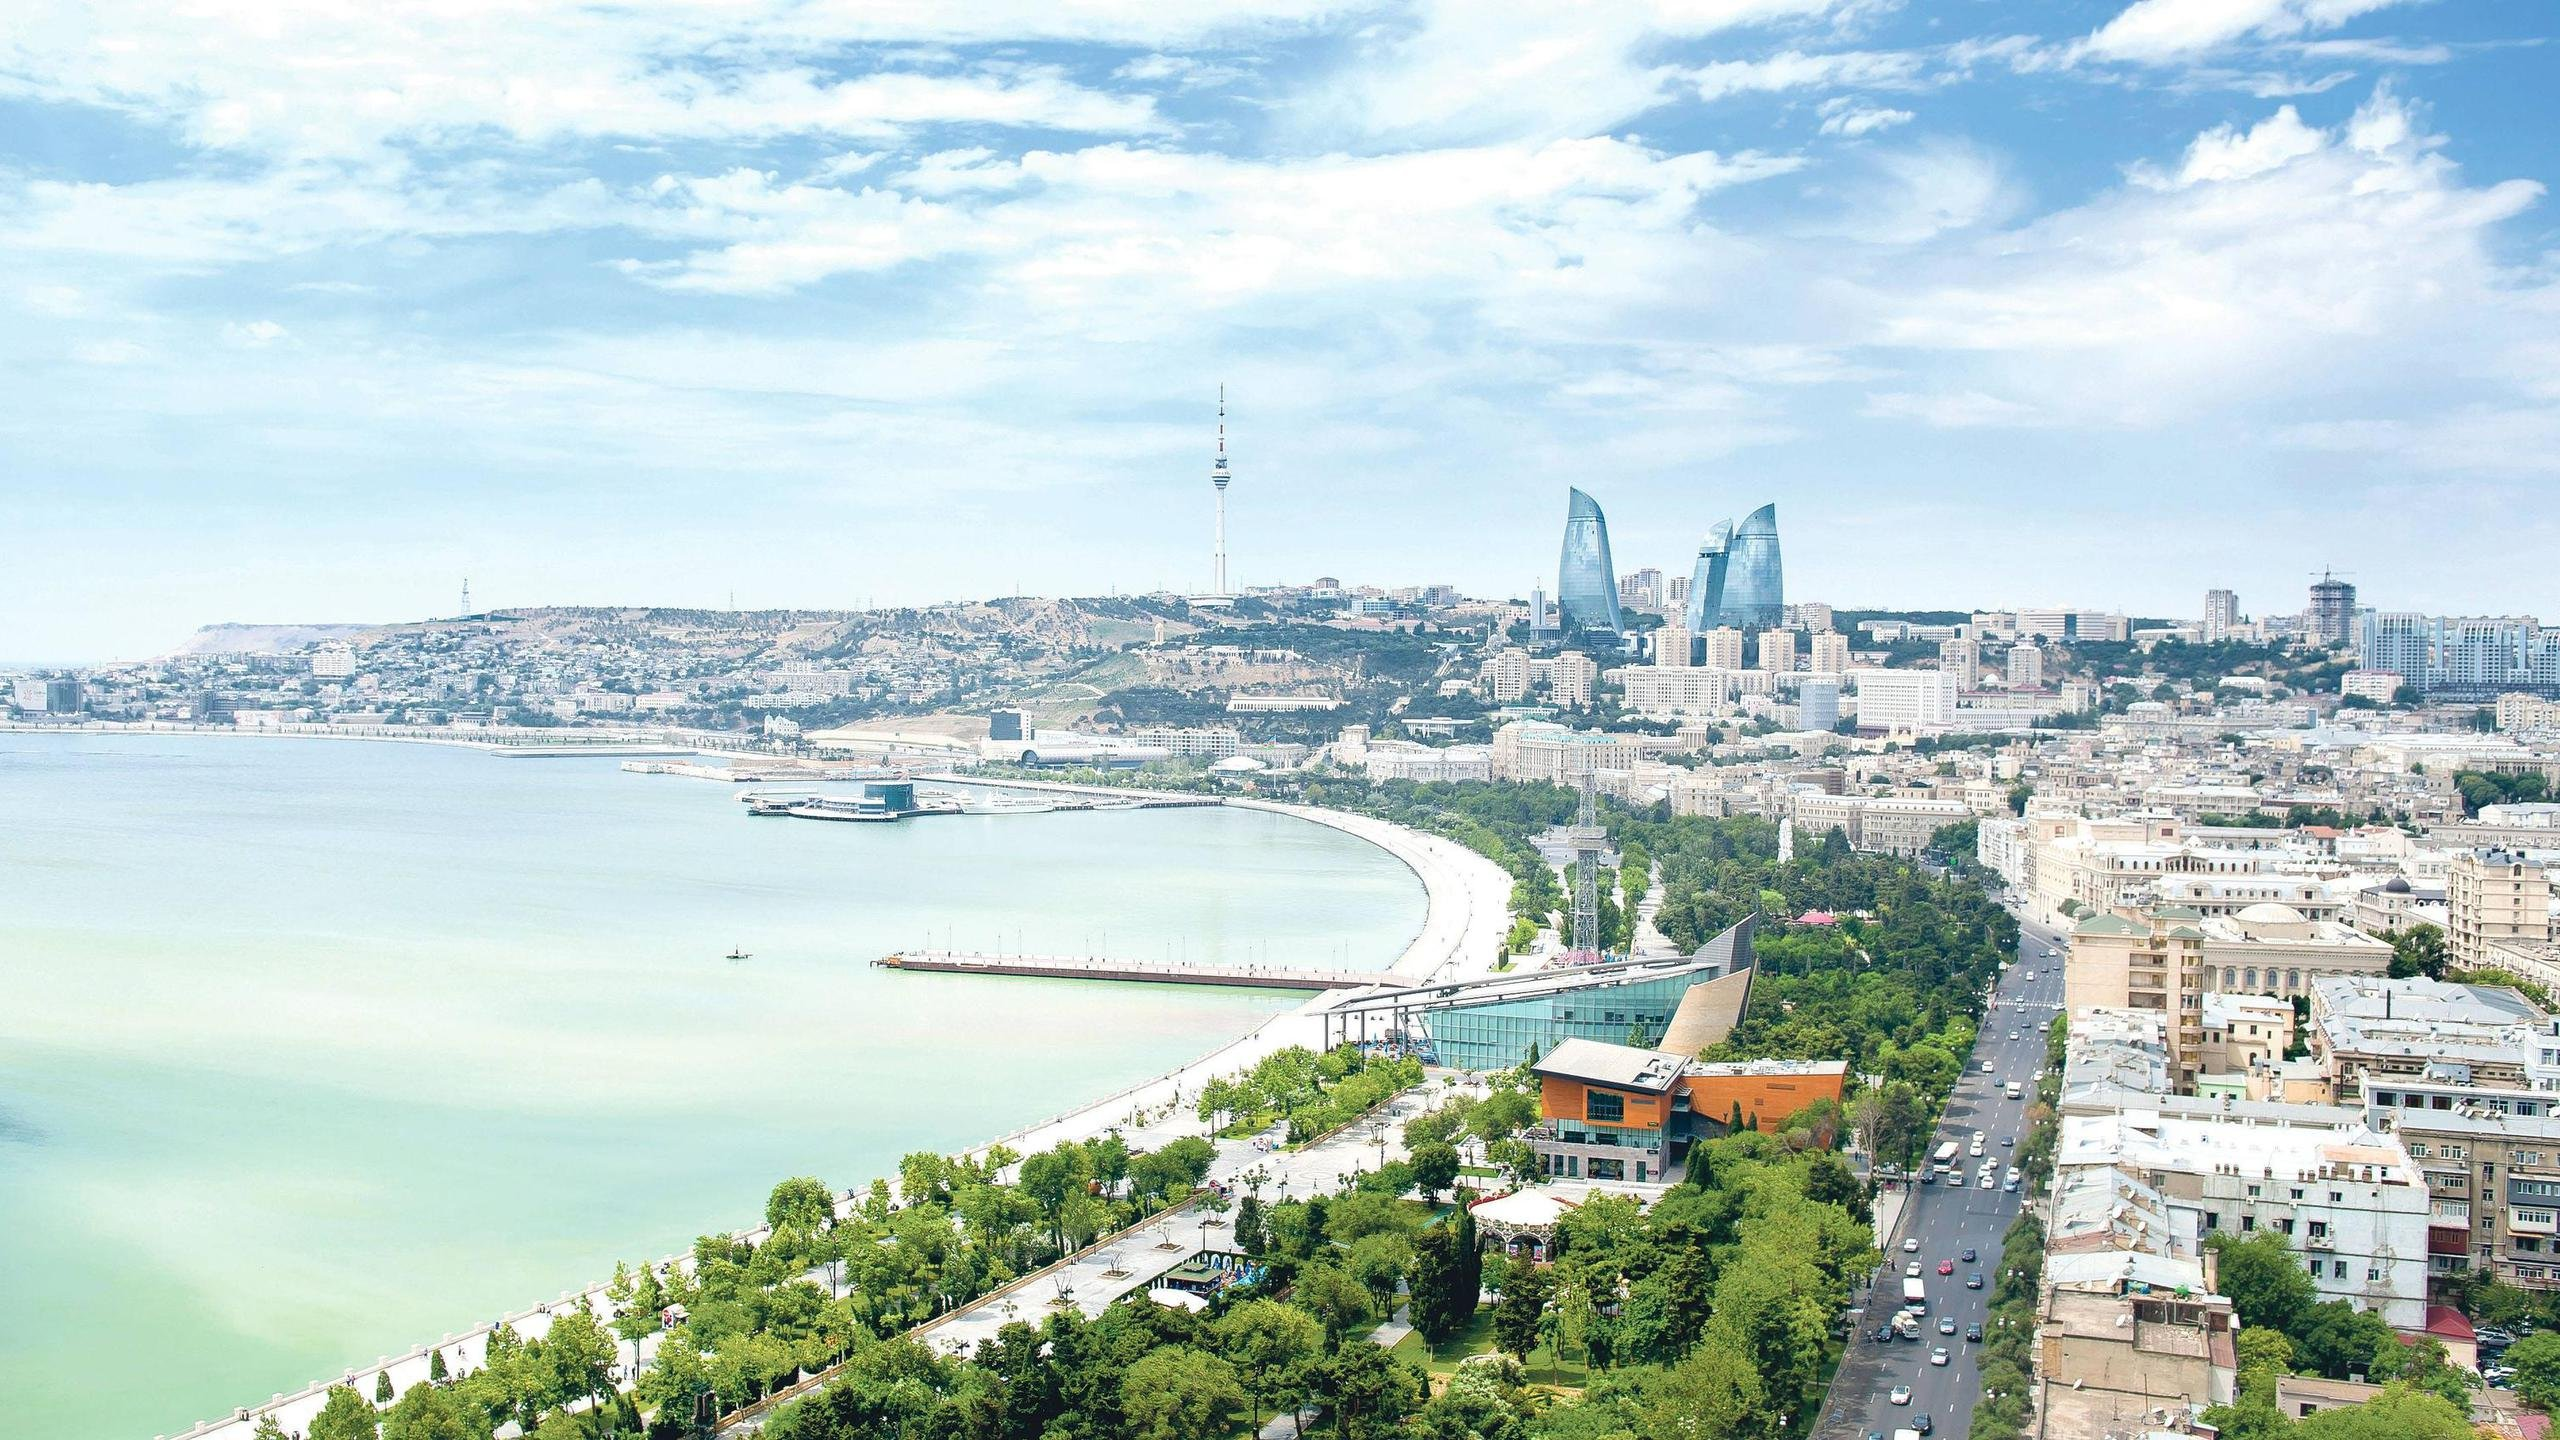 Baku Azerbaijan HD wallpaper 2560x1440